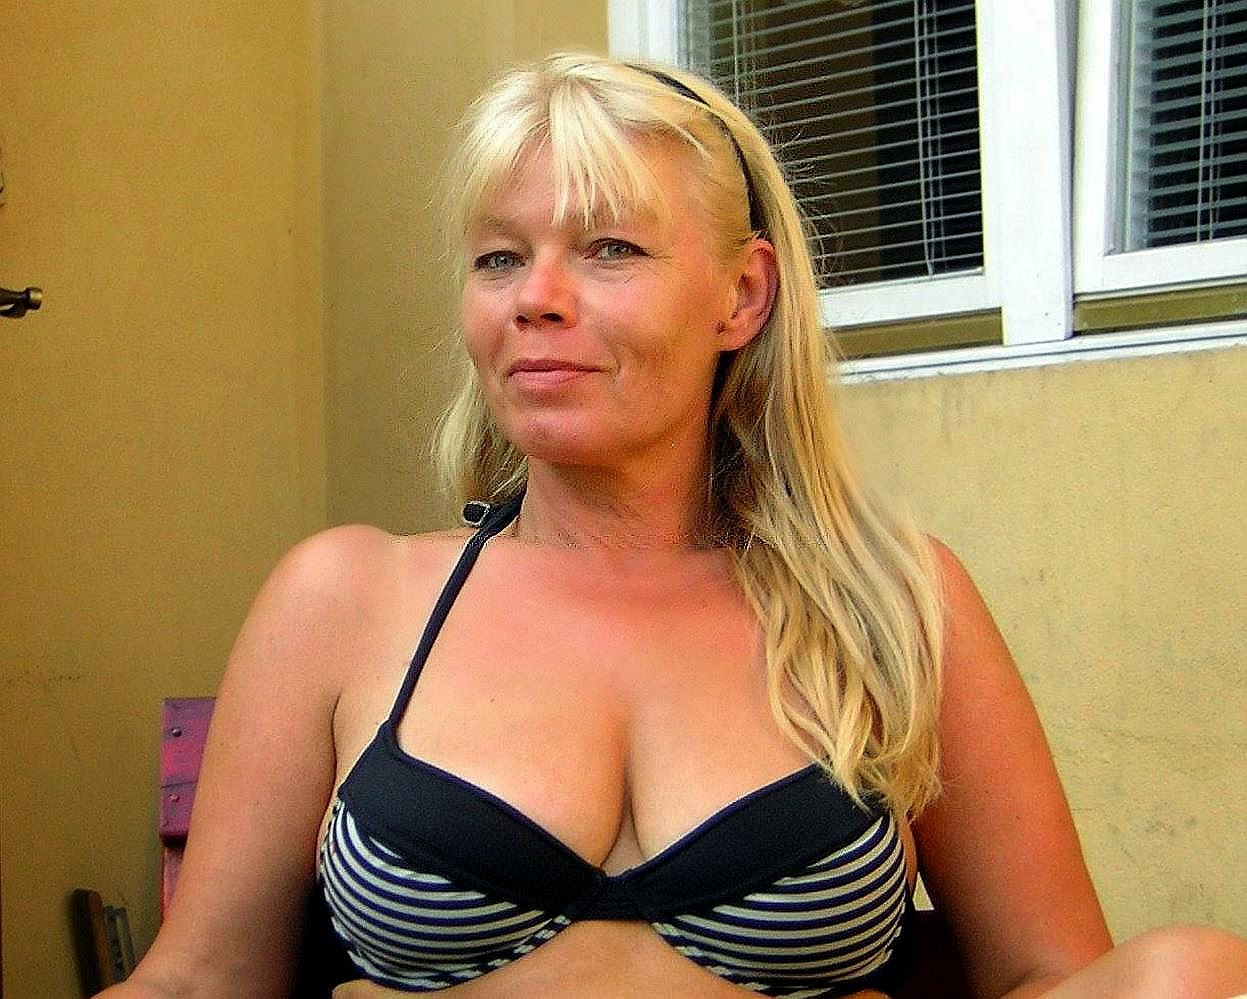 Sexual Seeking To 55 Kinky Man 50 Encounter Woman Seeking